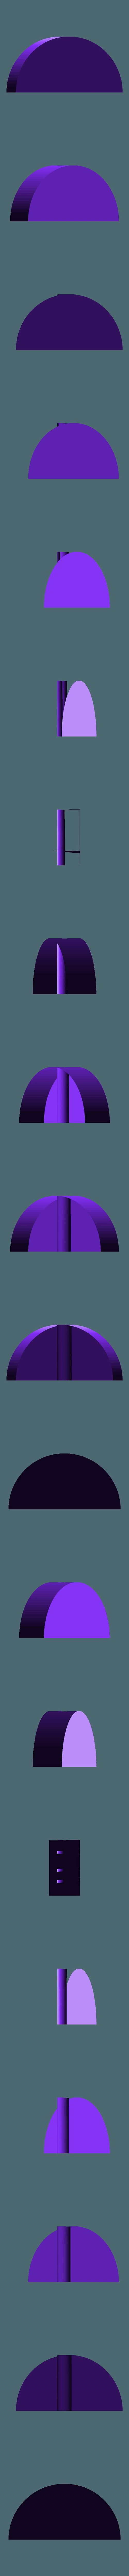 wmy-wheel-mid.stl Download free STL file MX MIDI Guitar • 3D print model, Adafruit